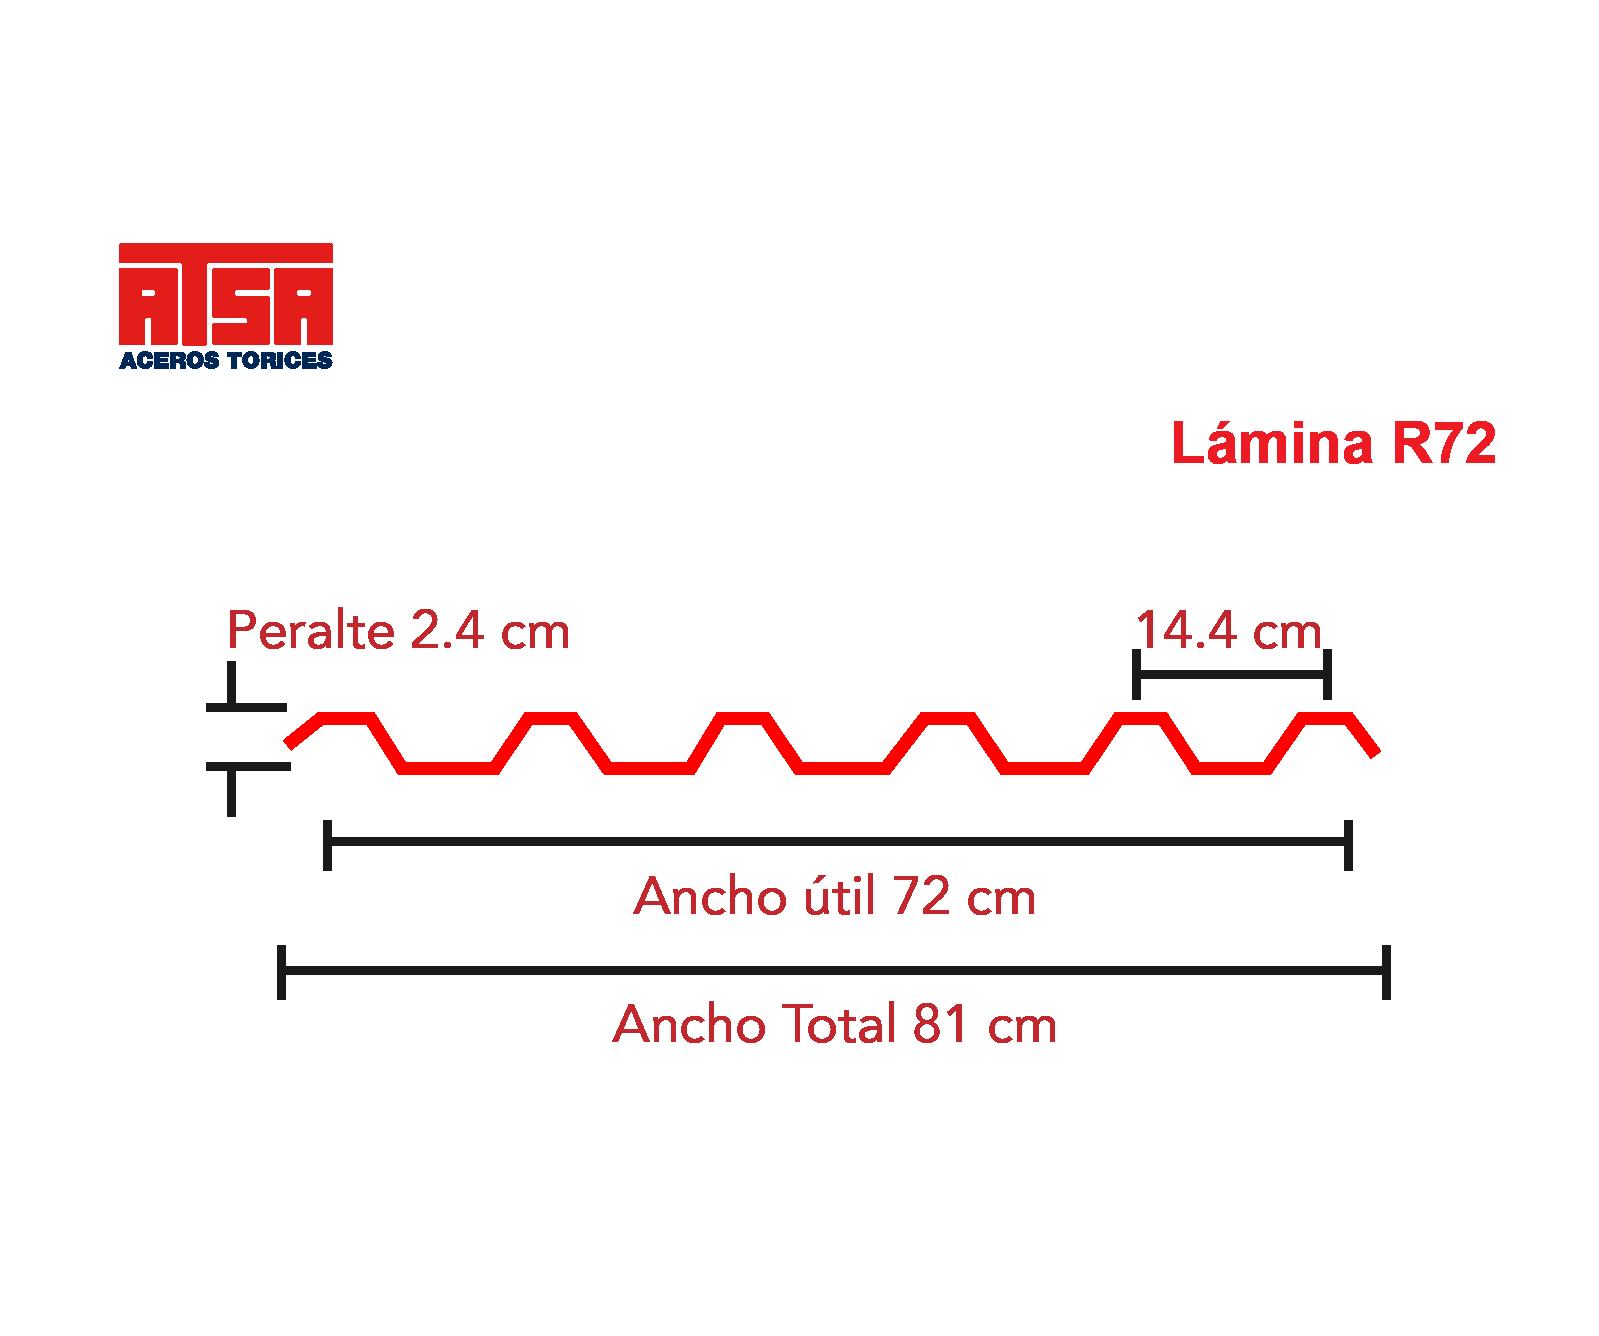 medidas-perfil-r72-lamina-de-aceros-atsa